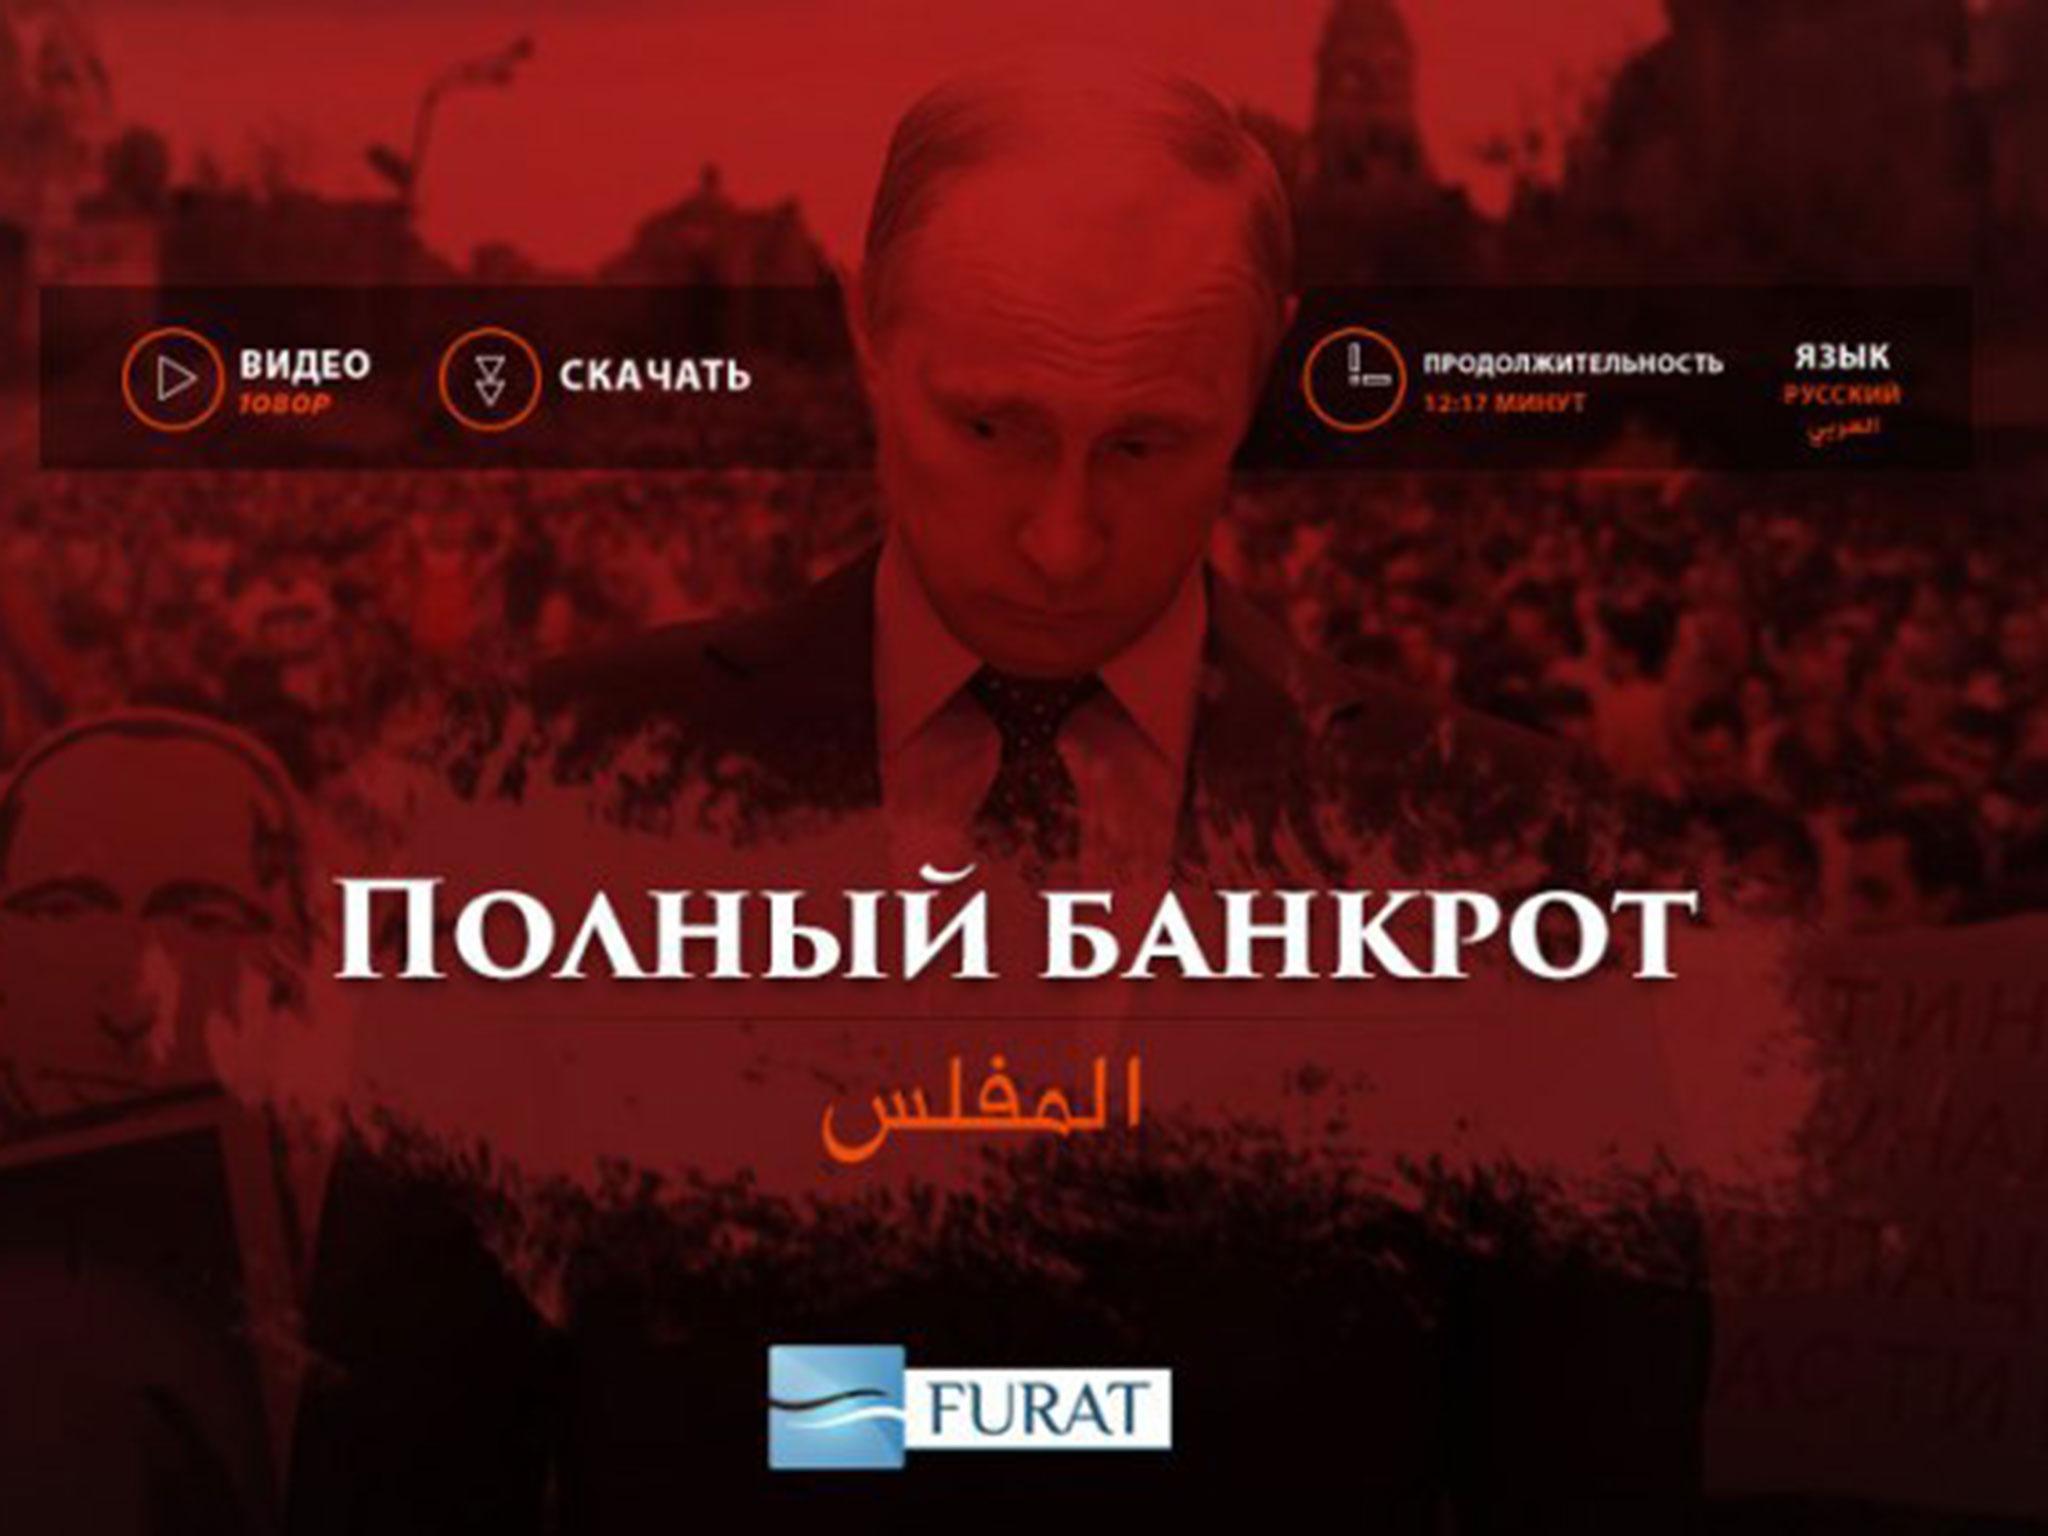 Секс видео русская девушка и трое мужчин фото 110-386